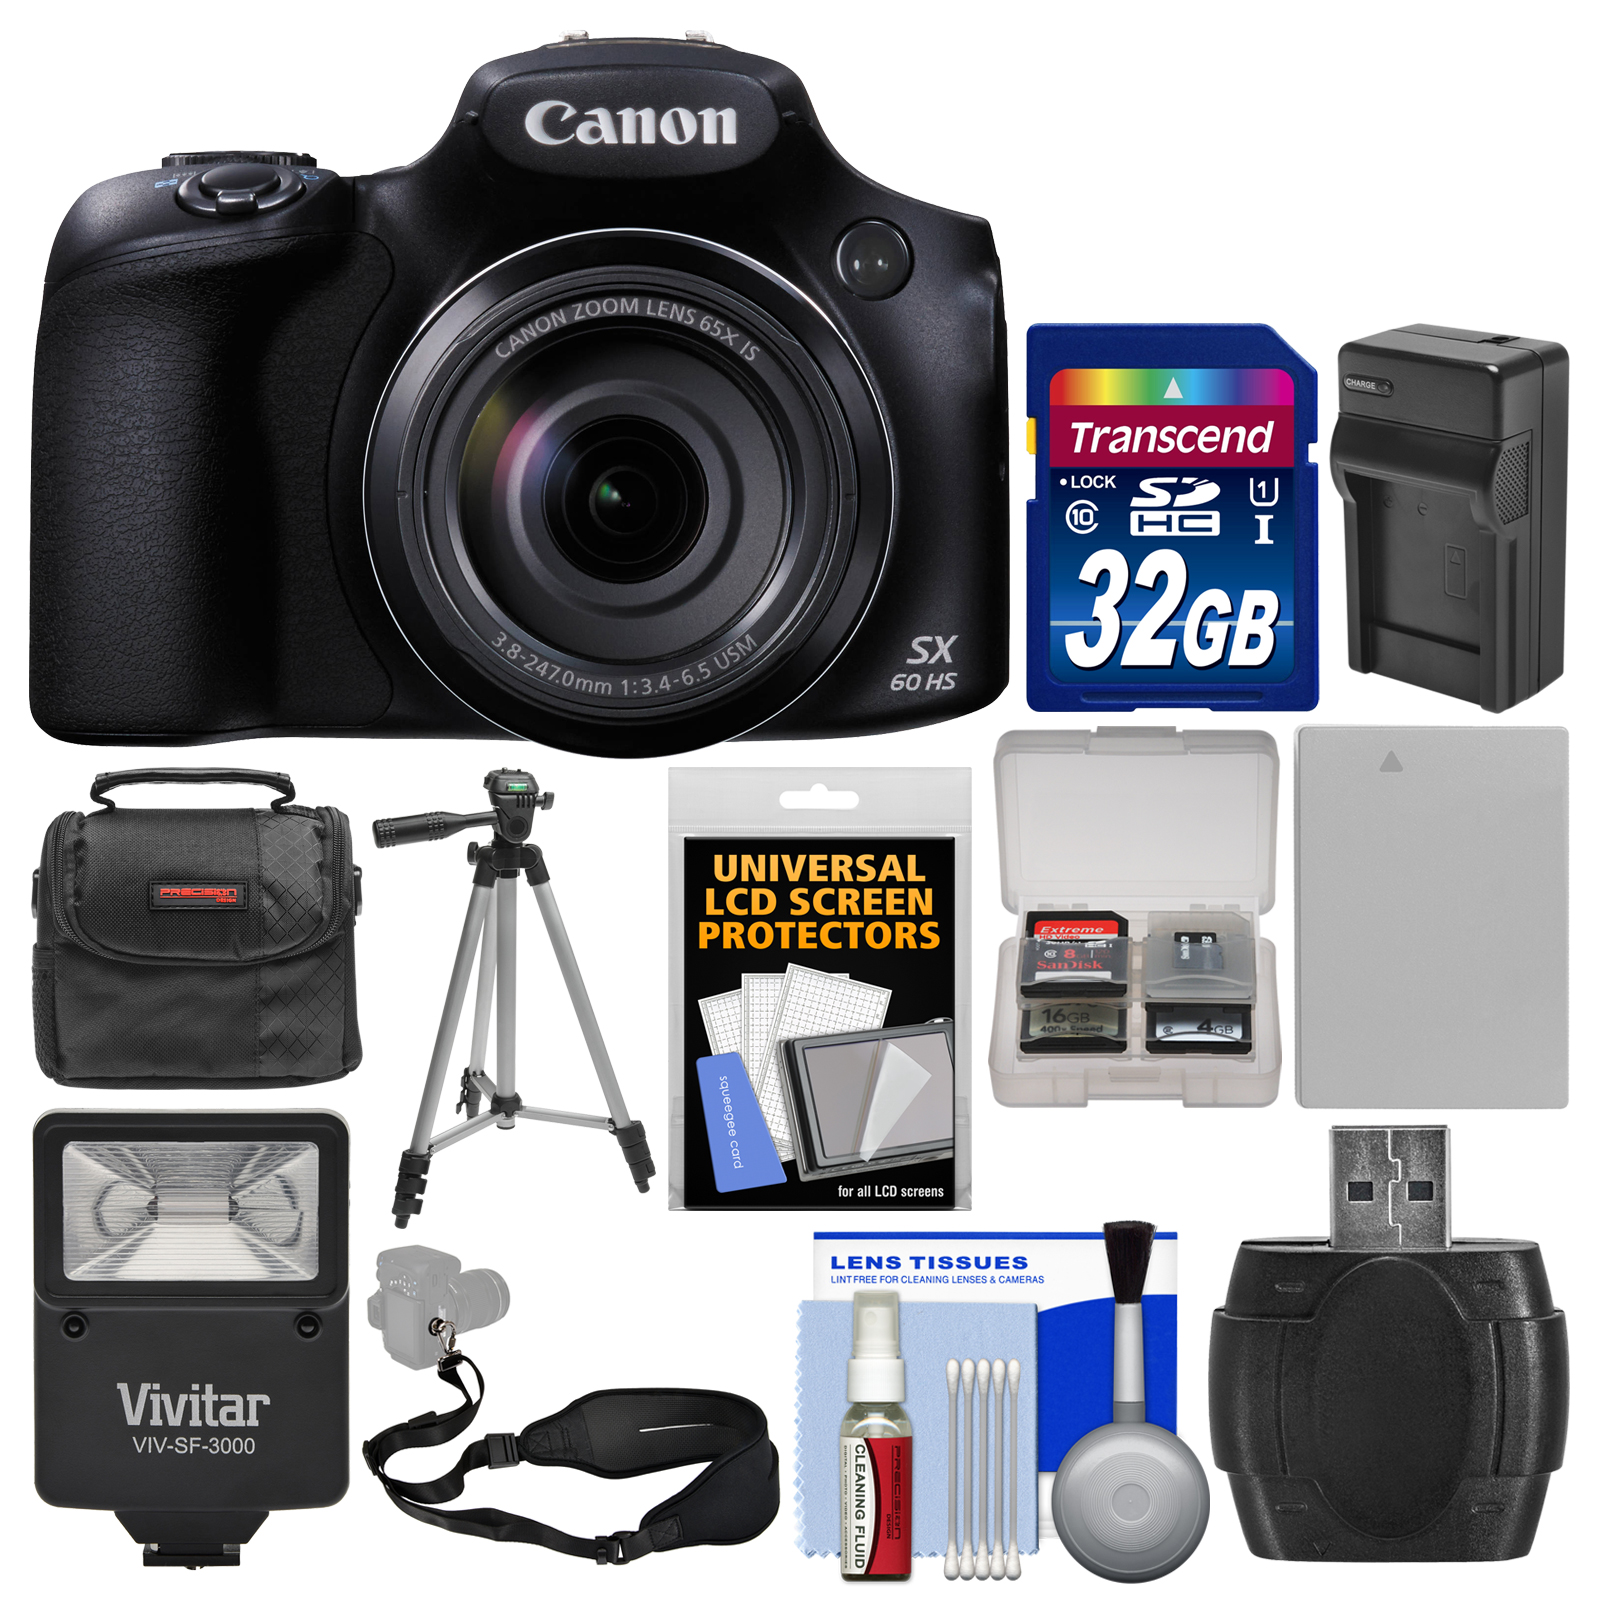 Canon PowerShot SX60 HS Wi-Fi Digital Camera with 32GB Ca...